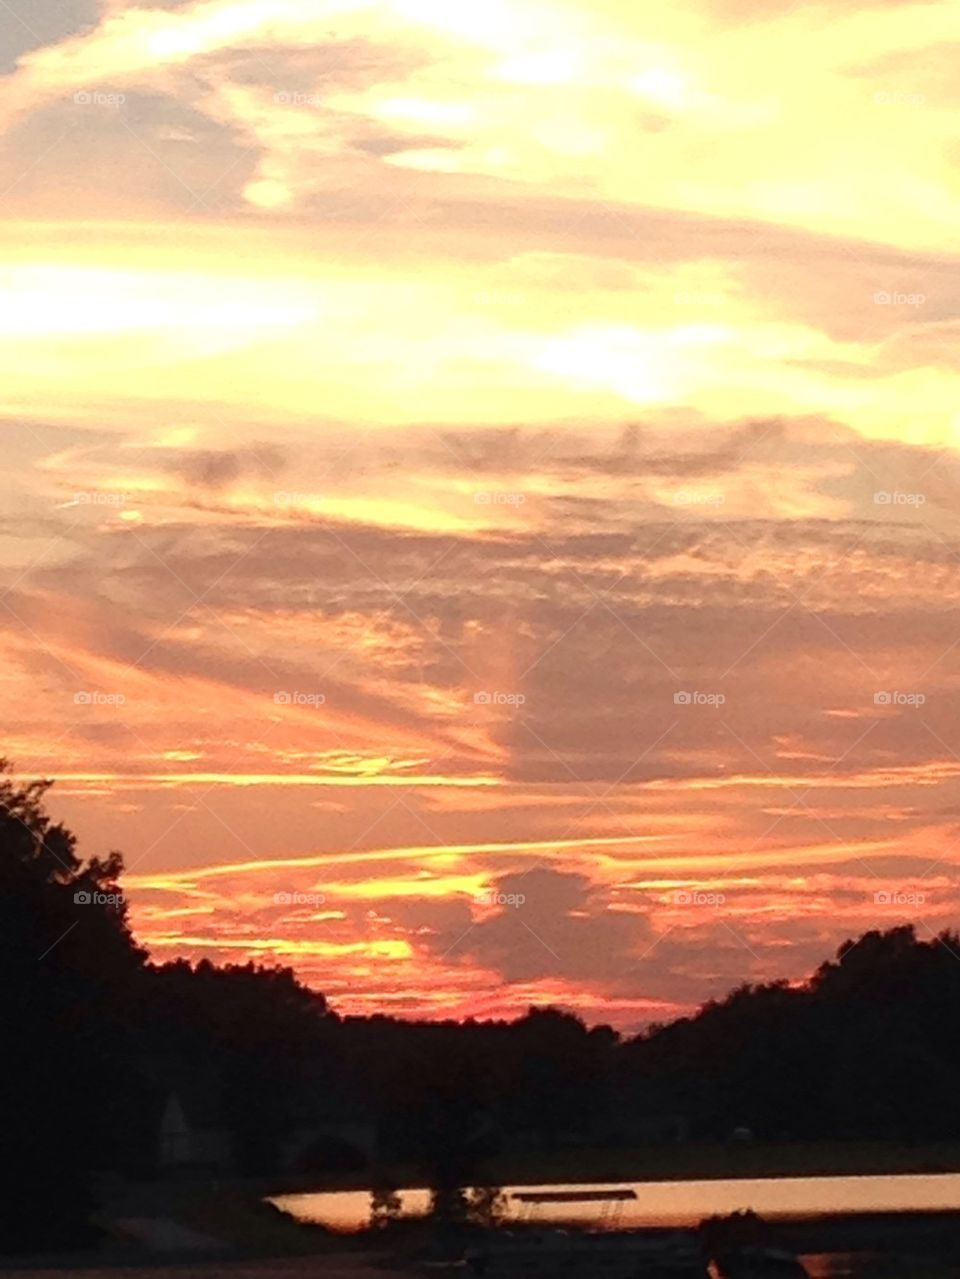 Sunset orange skies